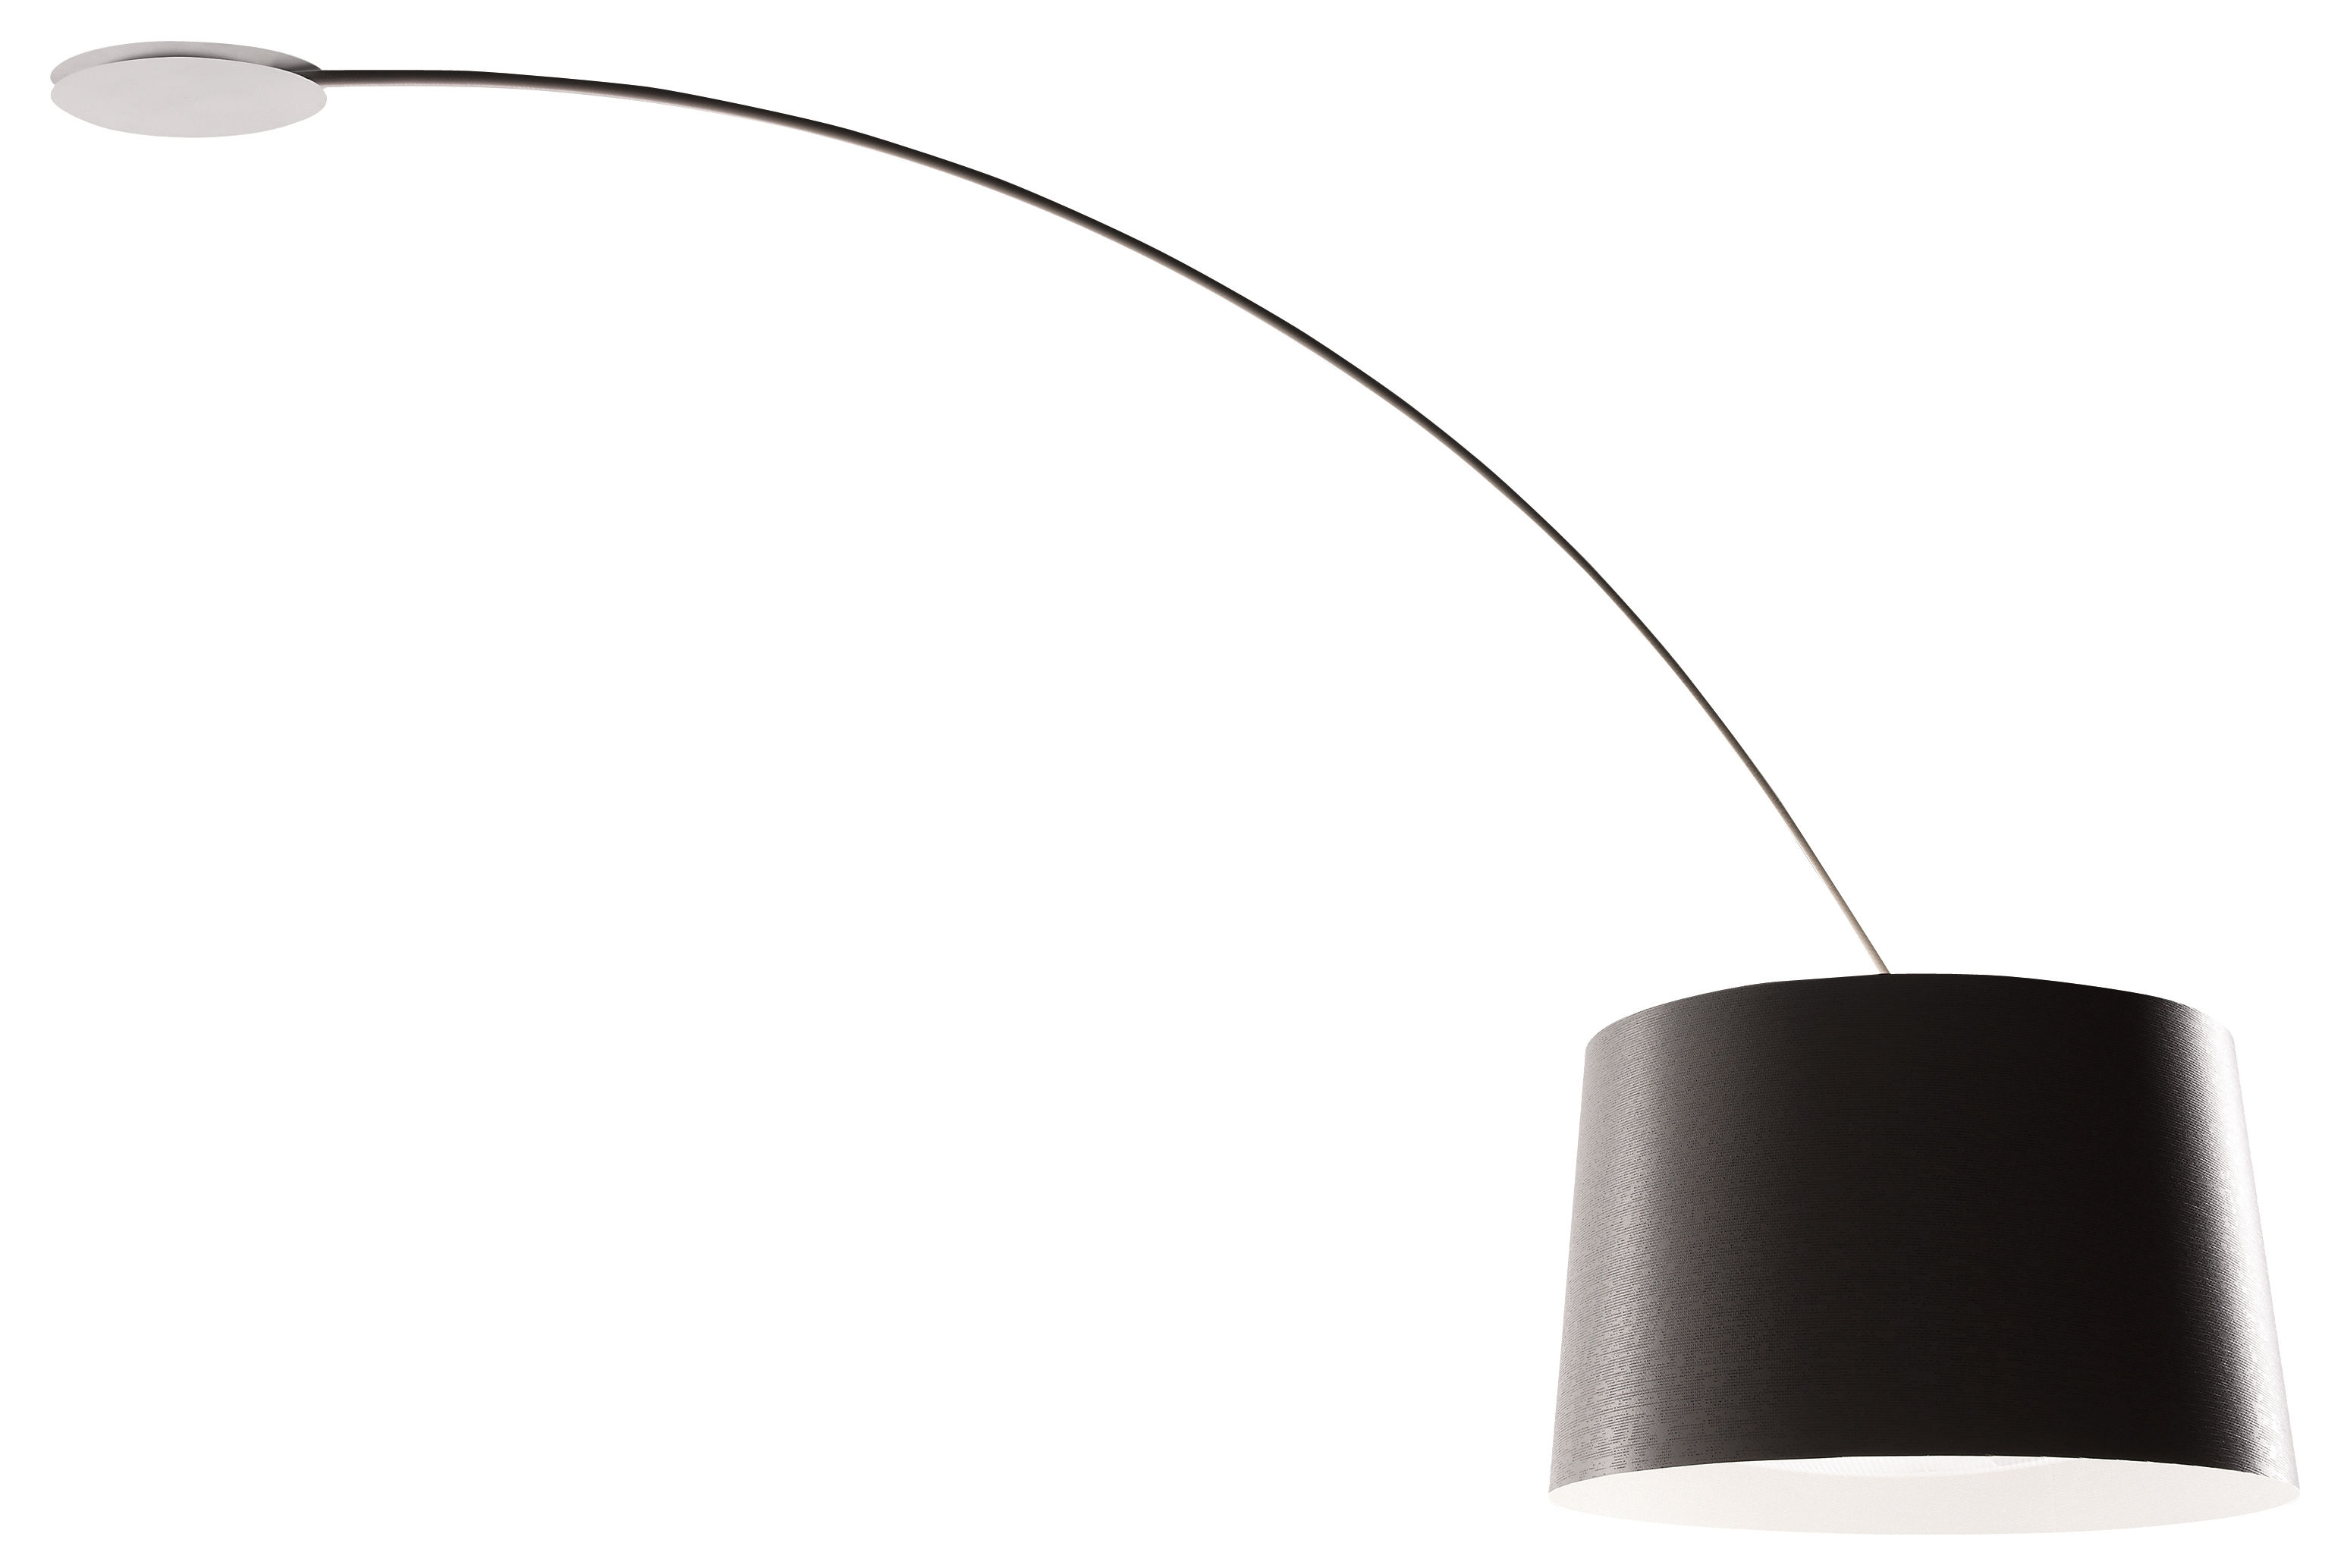 Luminaire - Suspensions - Plafonnier Twiggy / Rotatif - Foscarini - Noir - Fibre de verre, Matériau composite